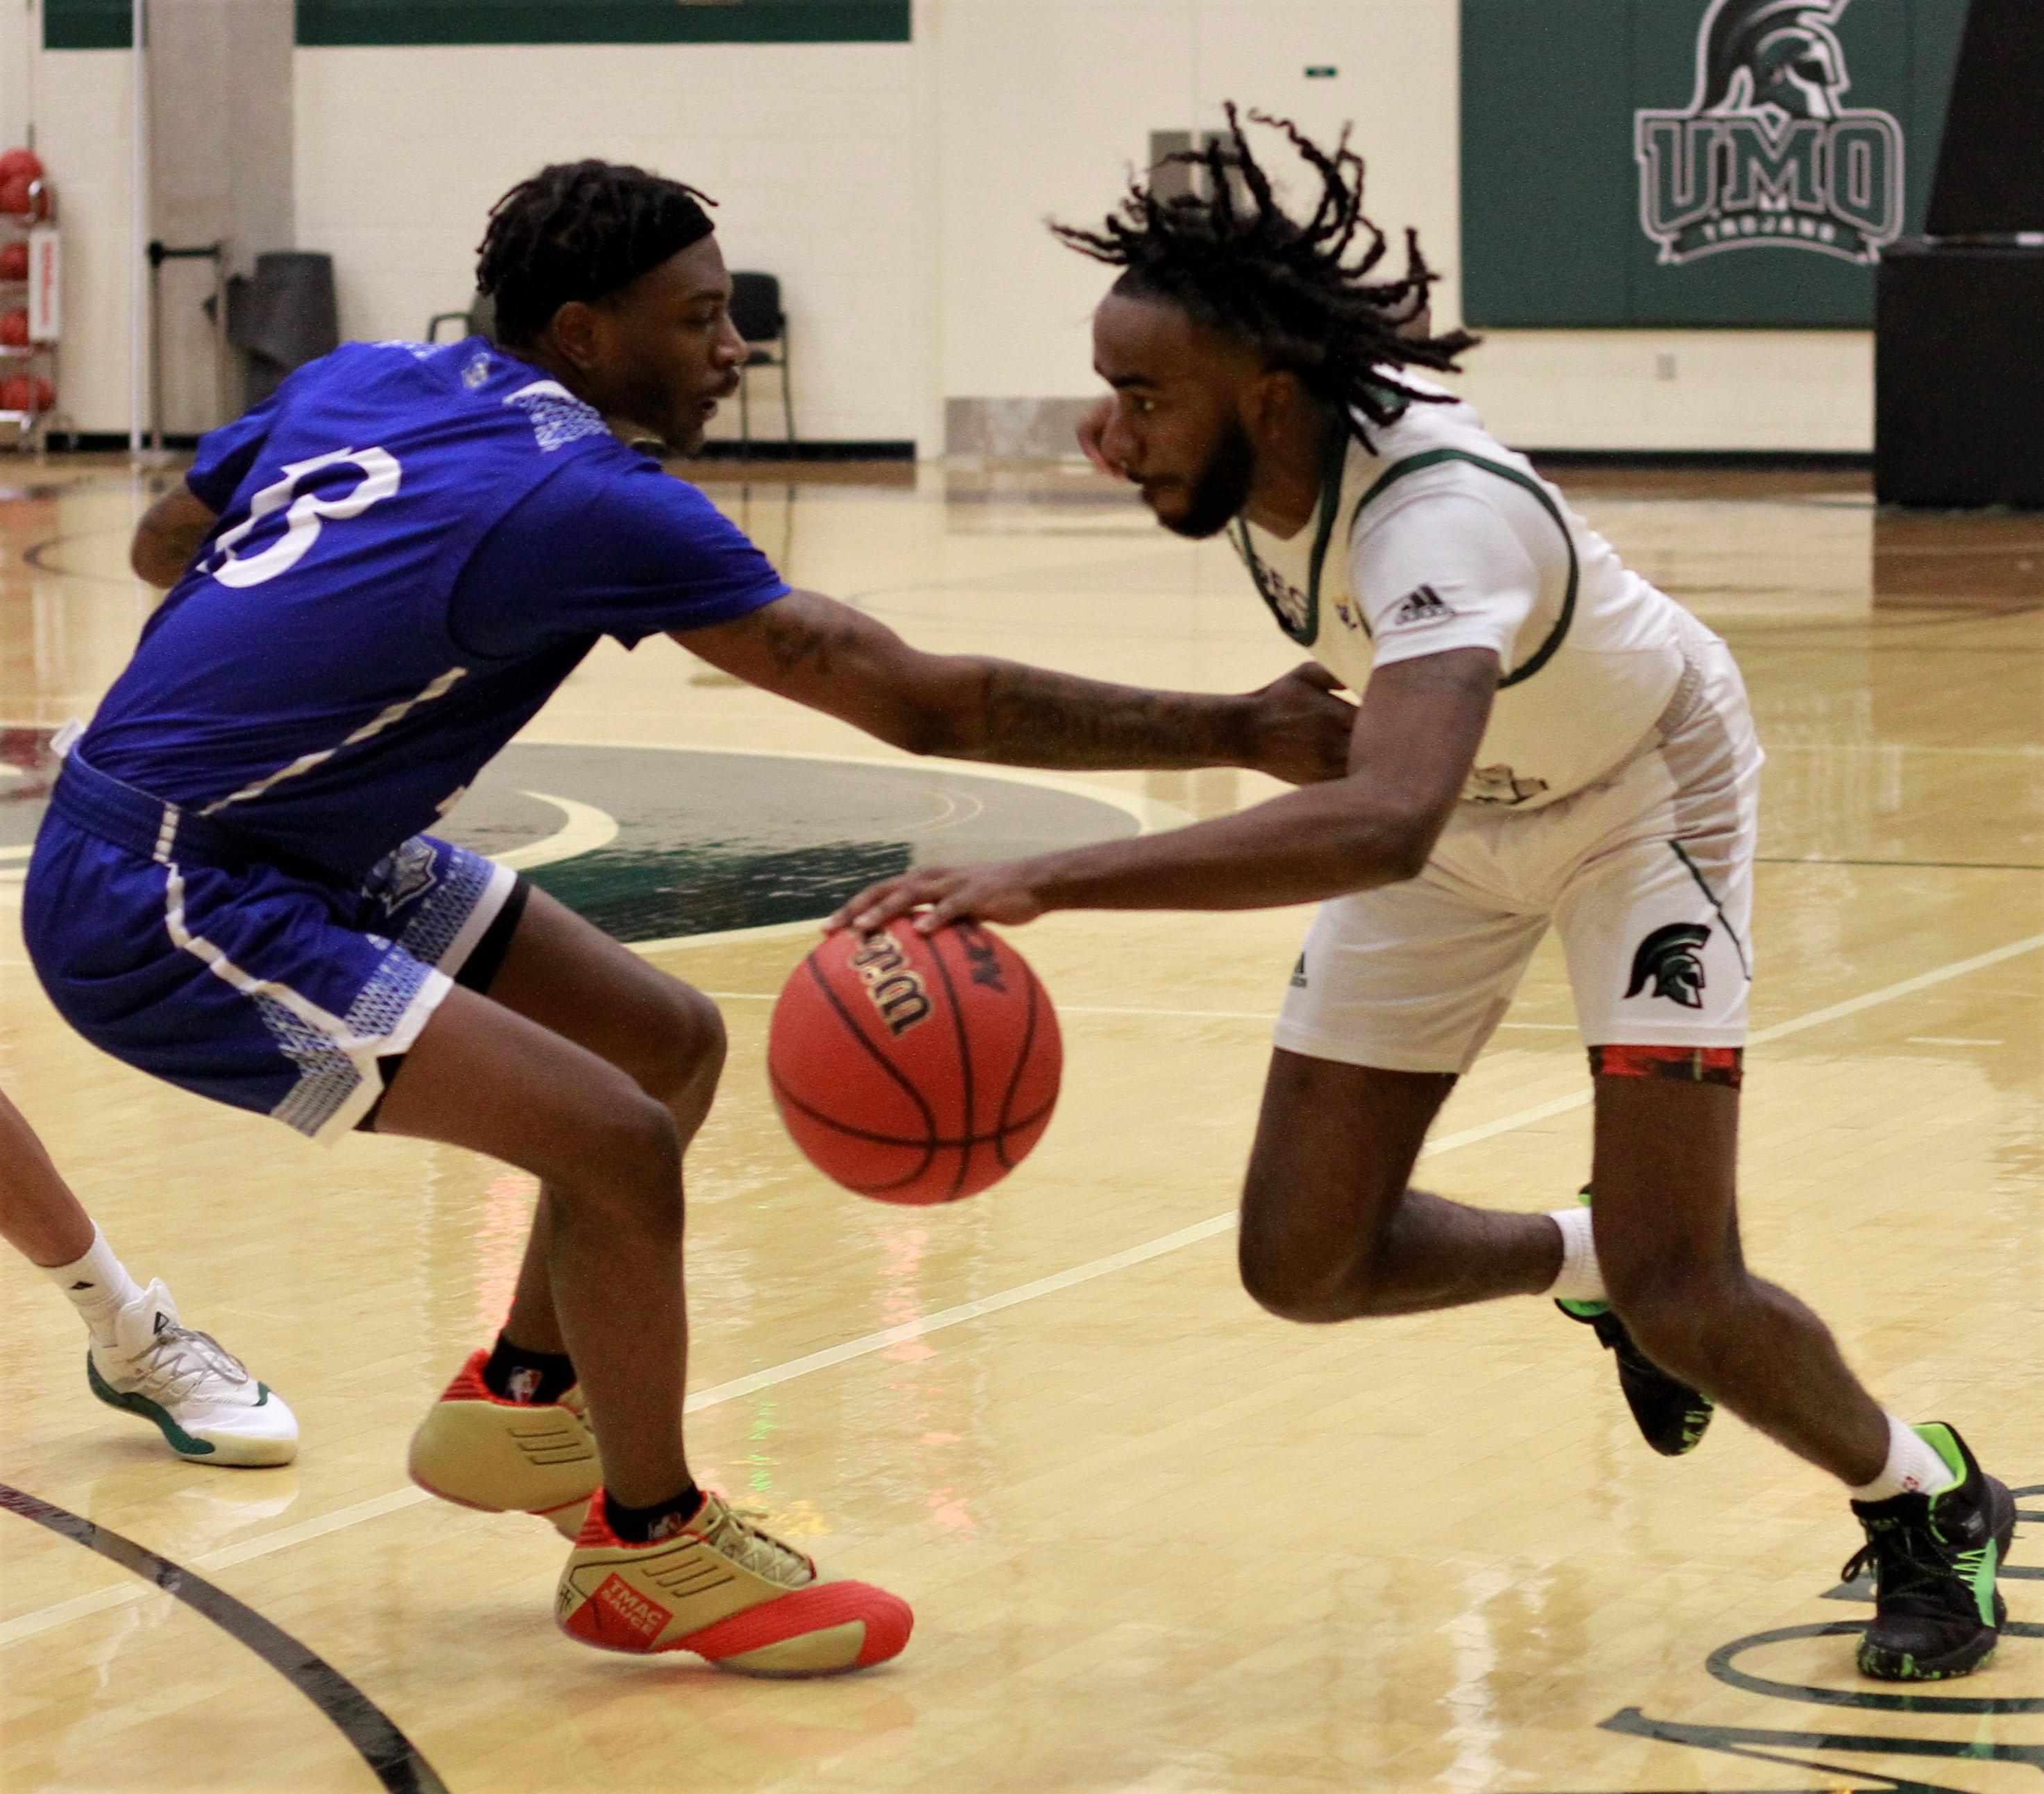 Men's Basketball: Southern Wesleyan Vs. UMO (PHOTO GALLERY)